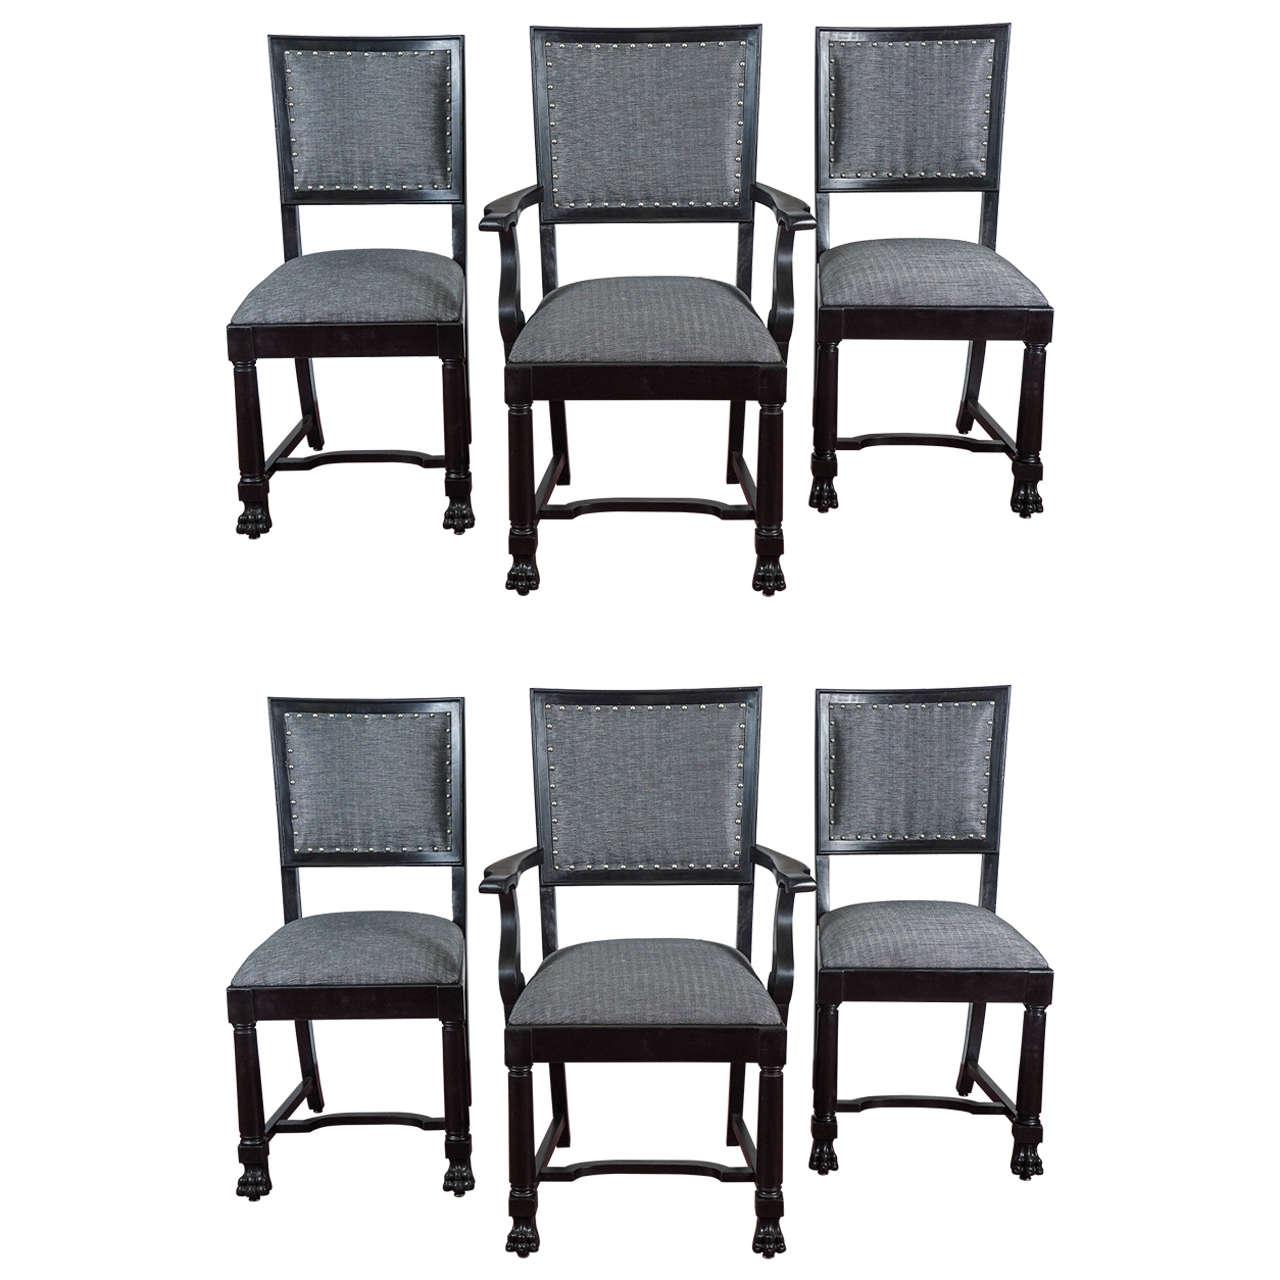 Ebonized Arts & Crafts Style Dining Chairs